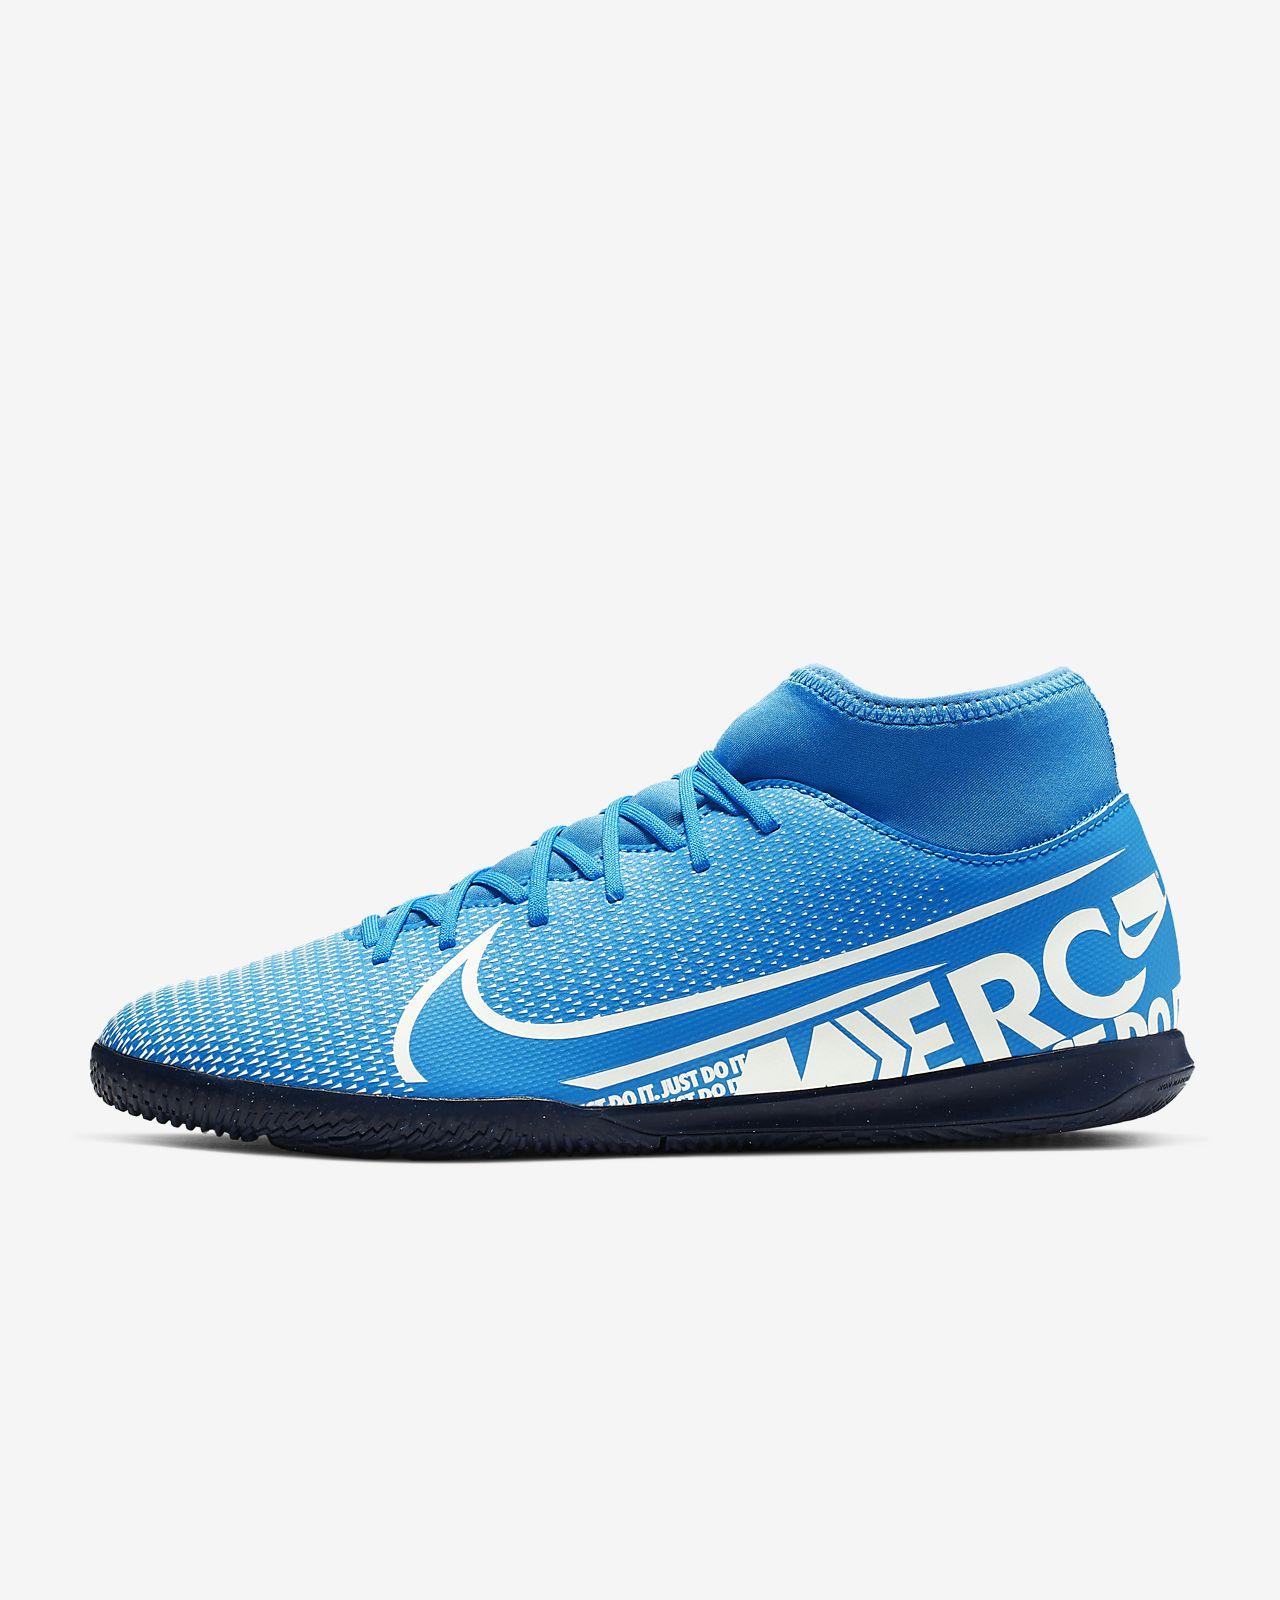 Nike Mercurial Superfly 7 Club IC Botas de fútbol sala